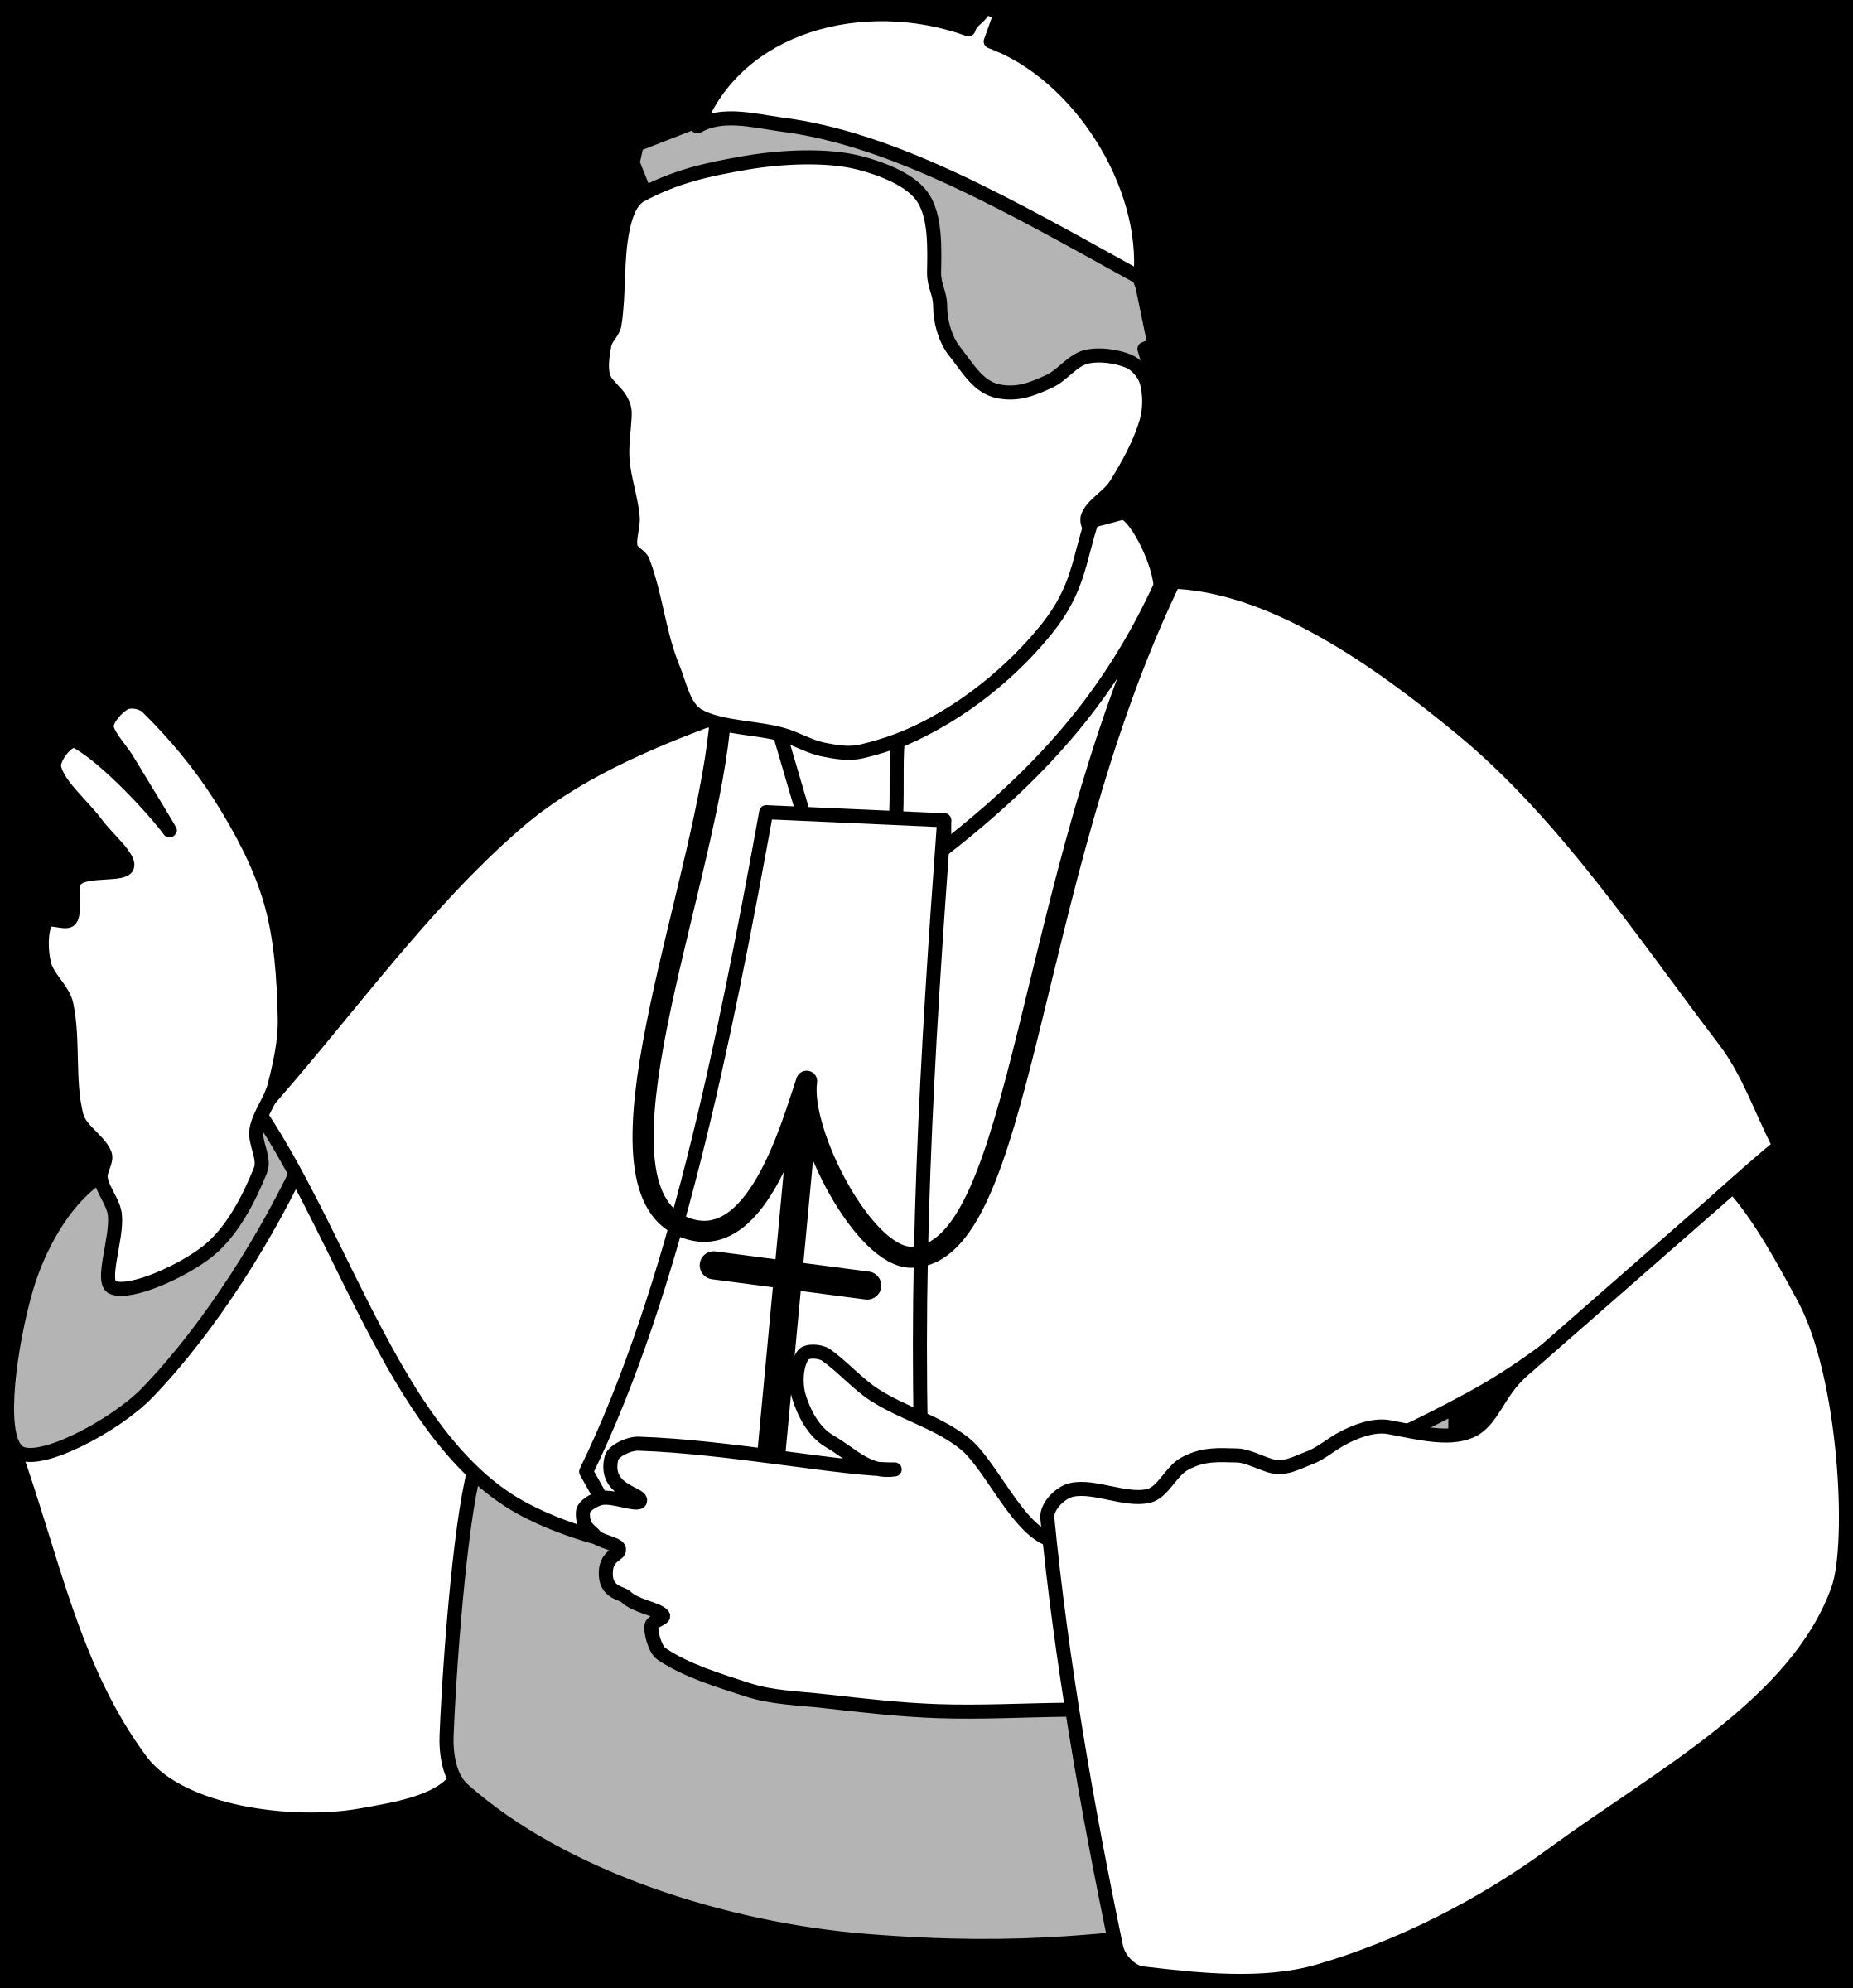 free download Rabbi clipart. Pope big image png.